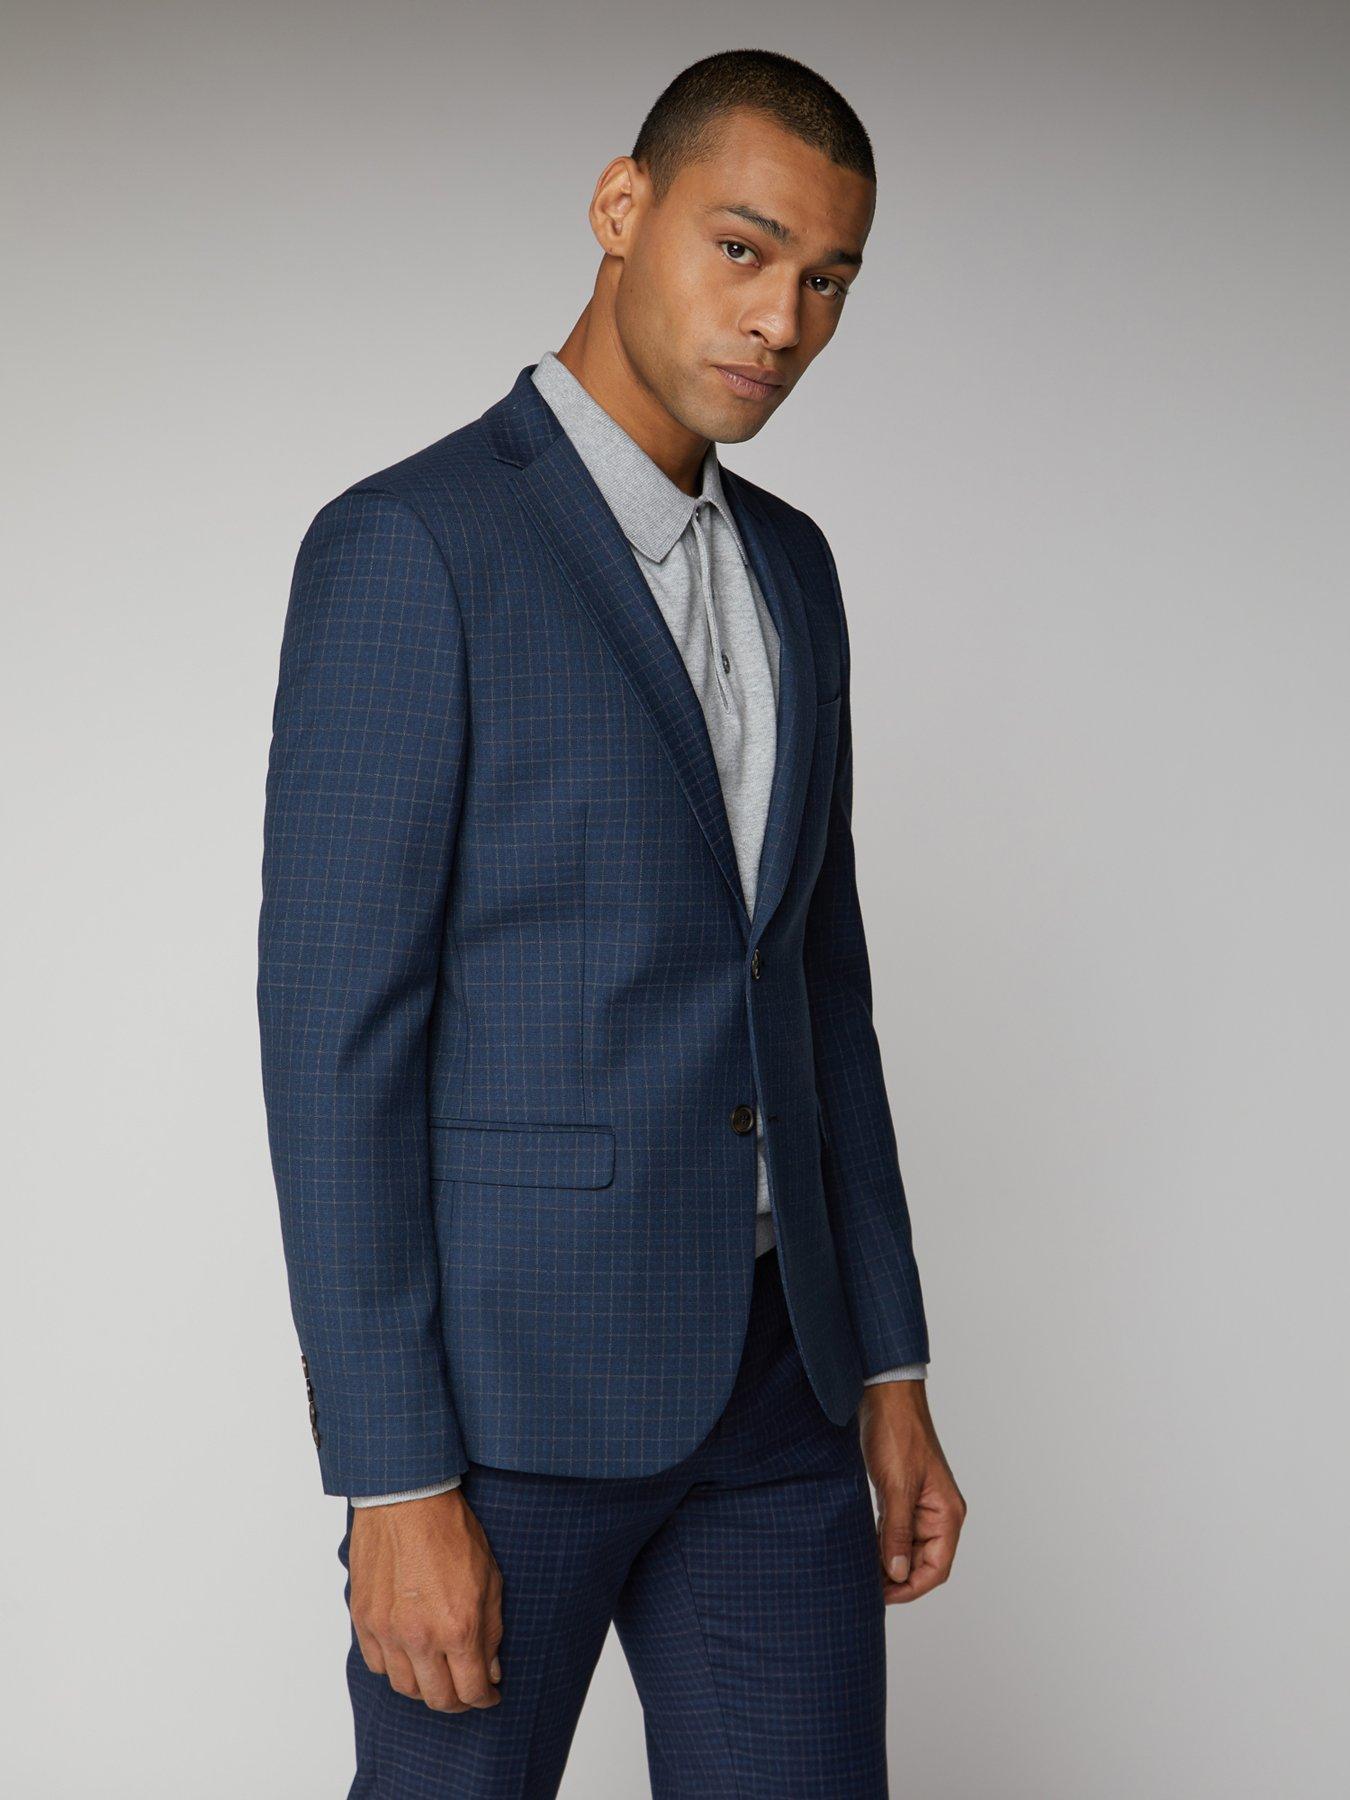 Superb Ben Sherman Suit Blazer Size 36R